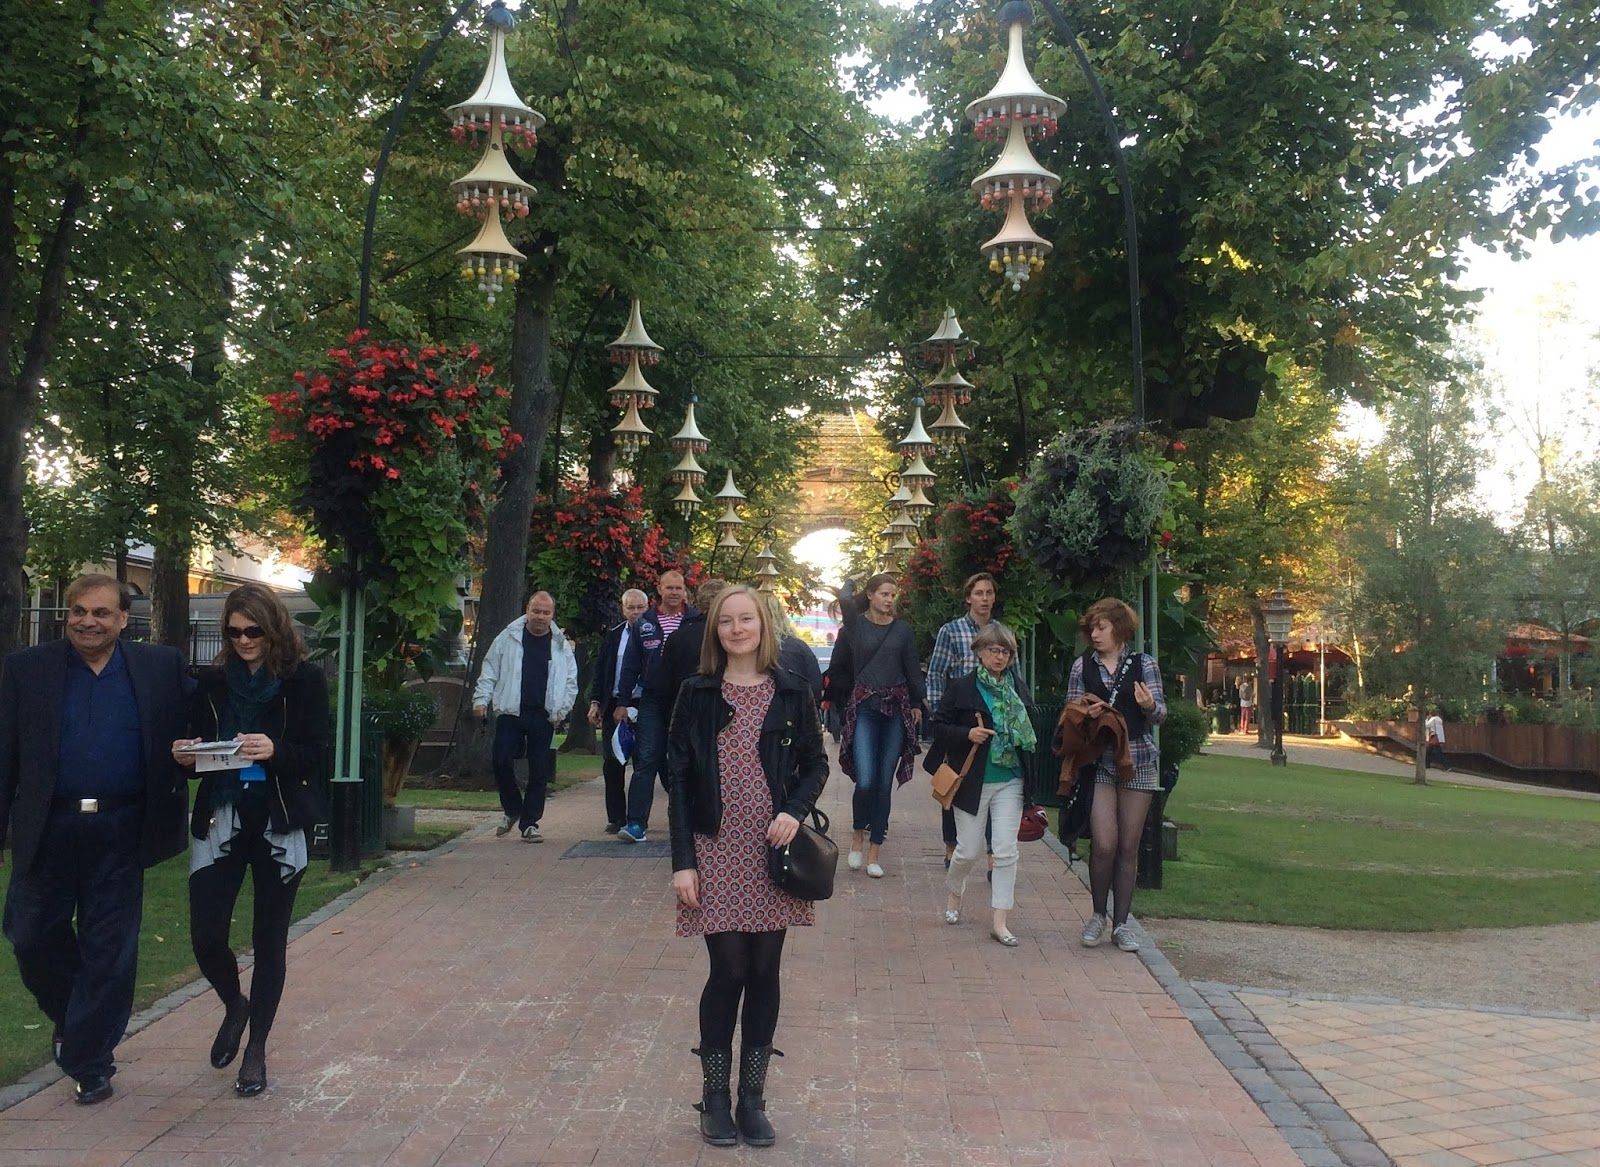 Trip to Copenhagen, Denmark - Tivoli